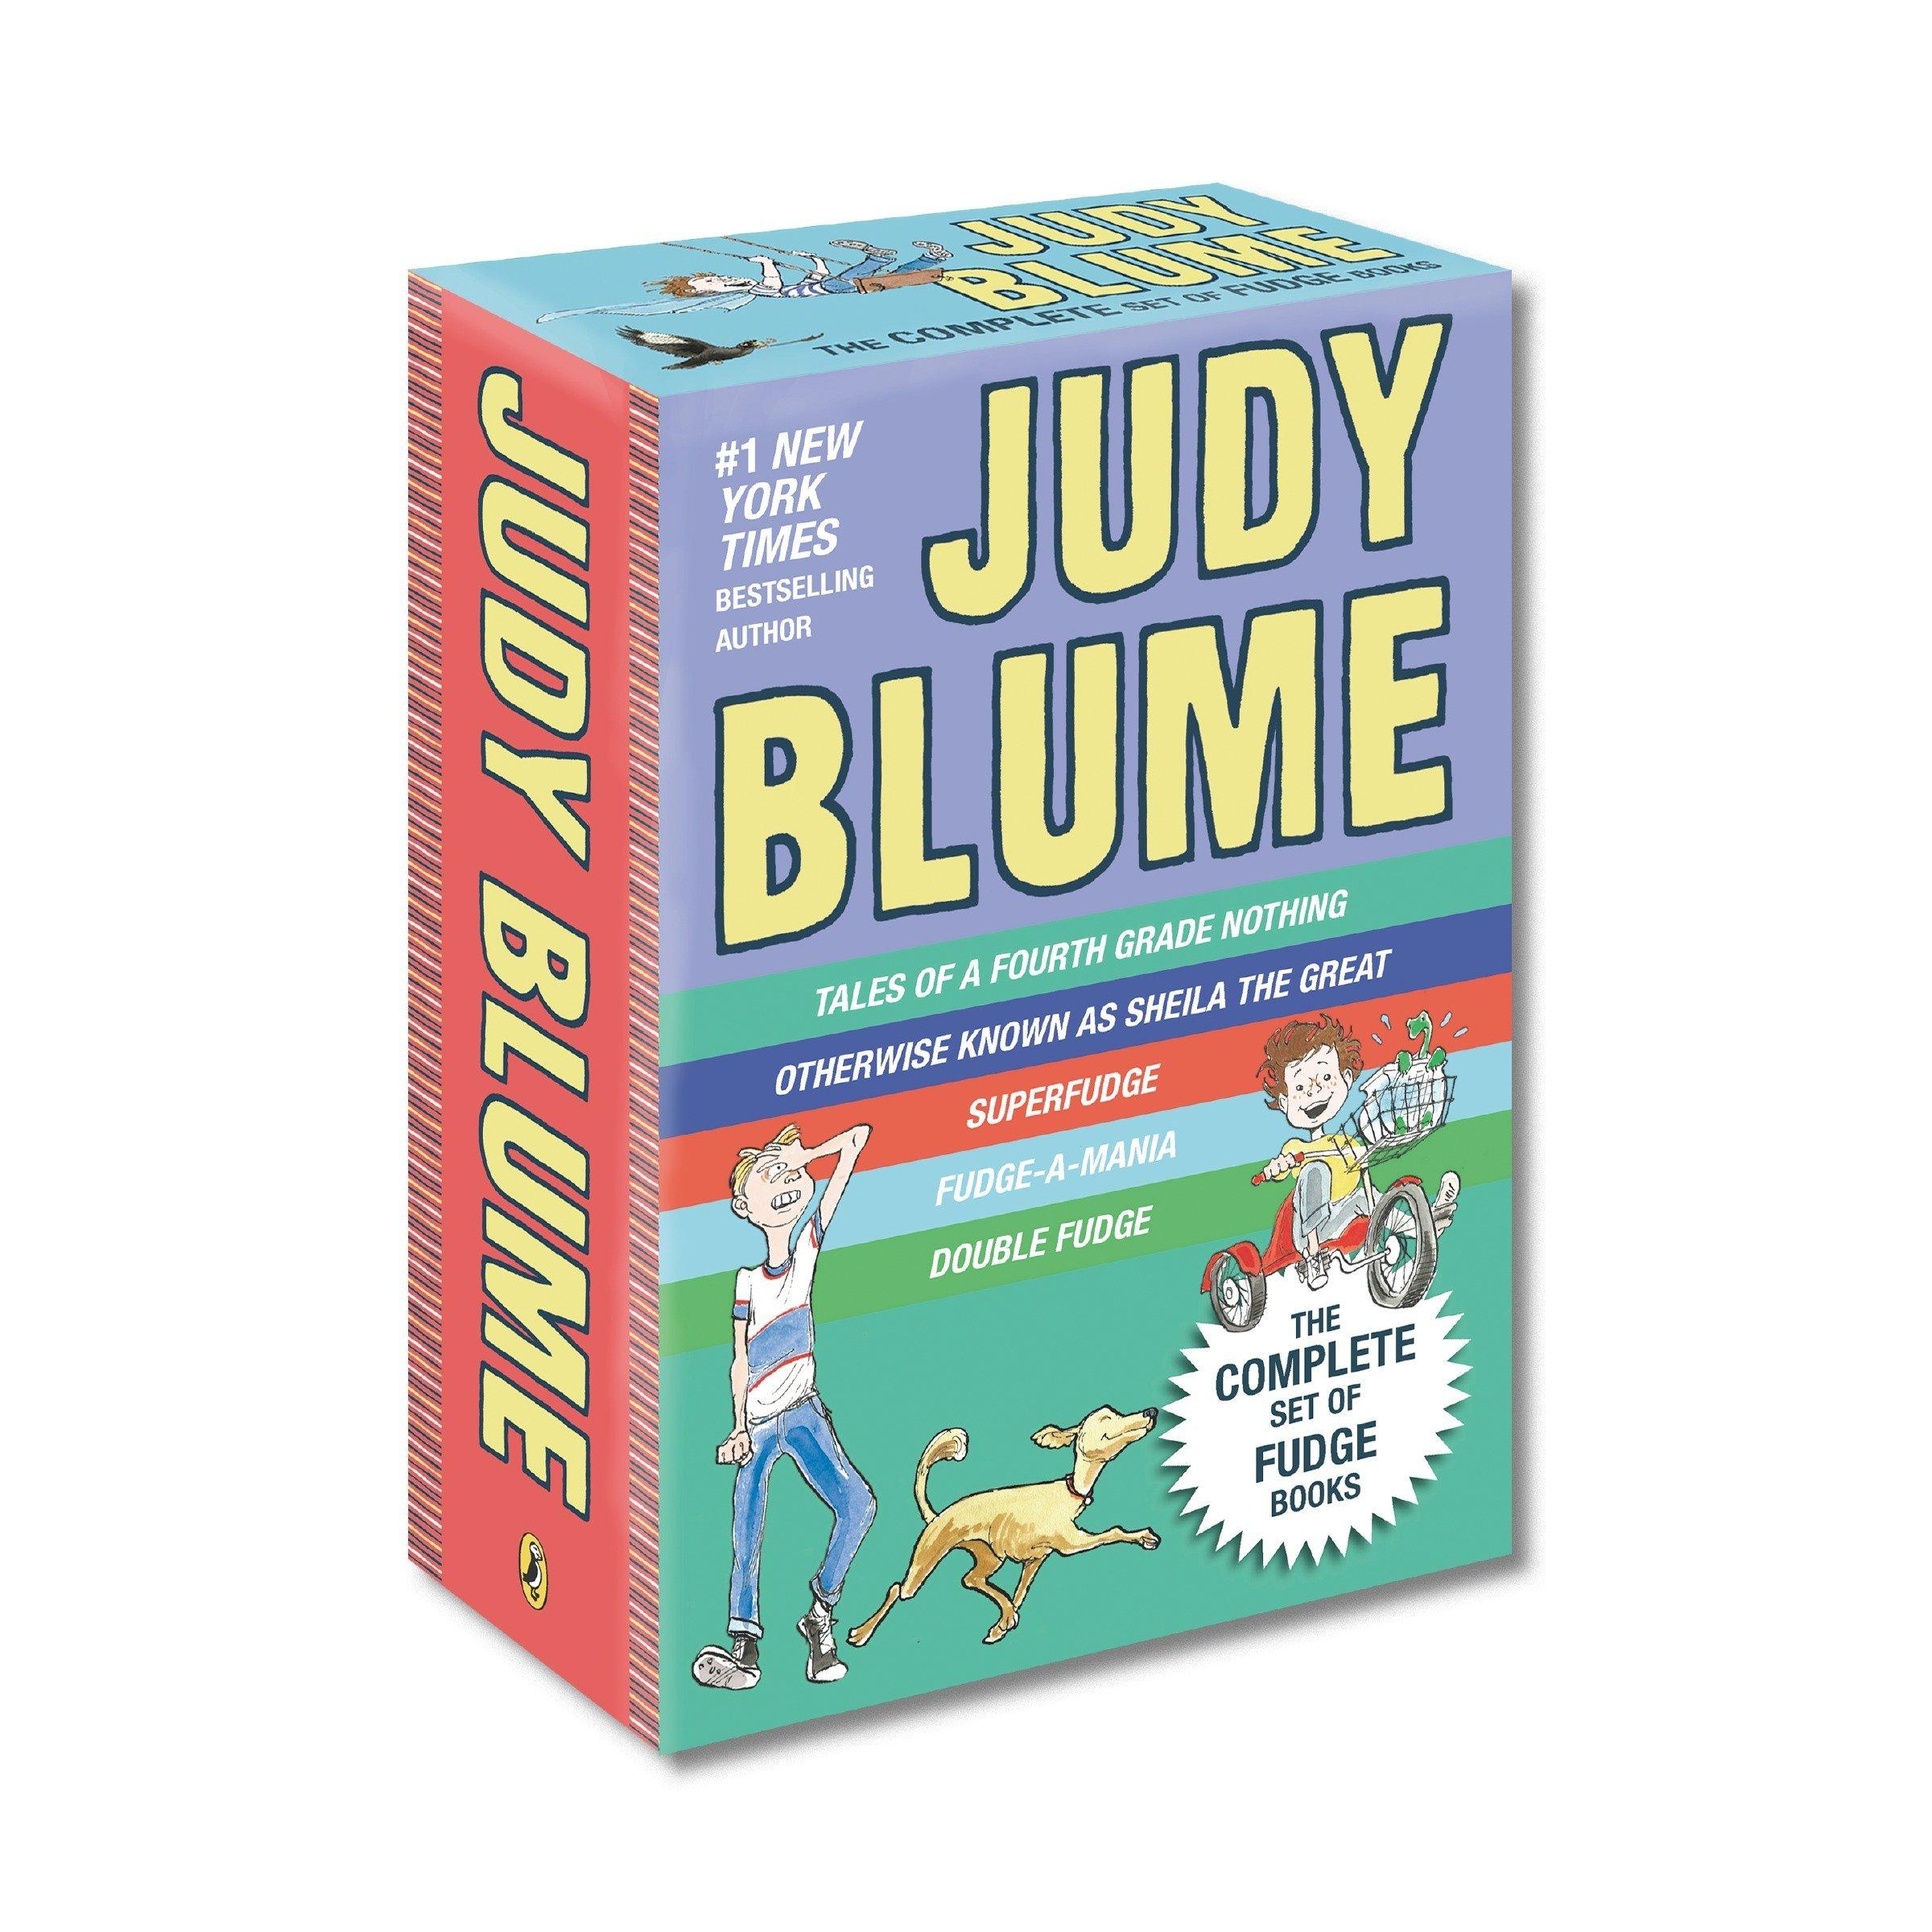 Judy Blume's Fudge Box Set by Puffin & Company